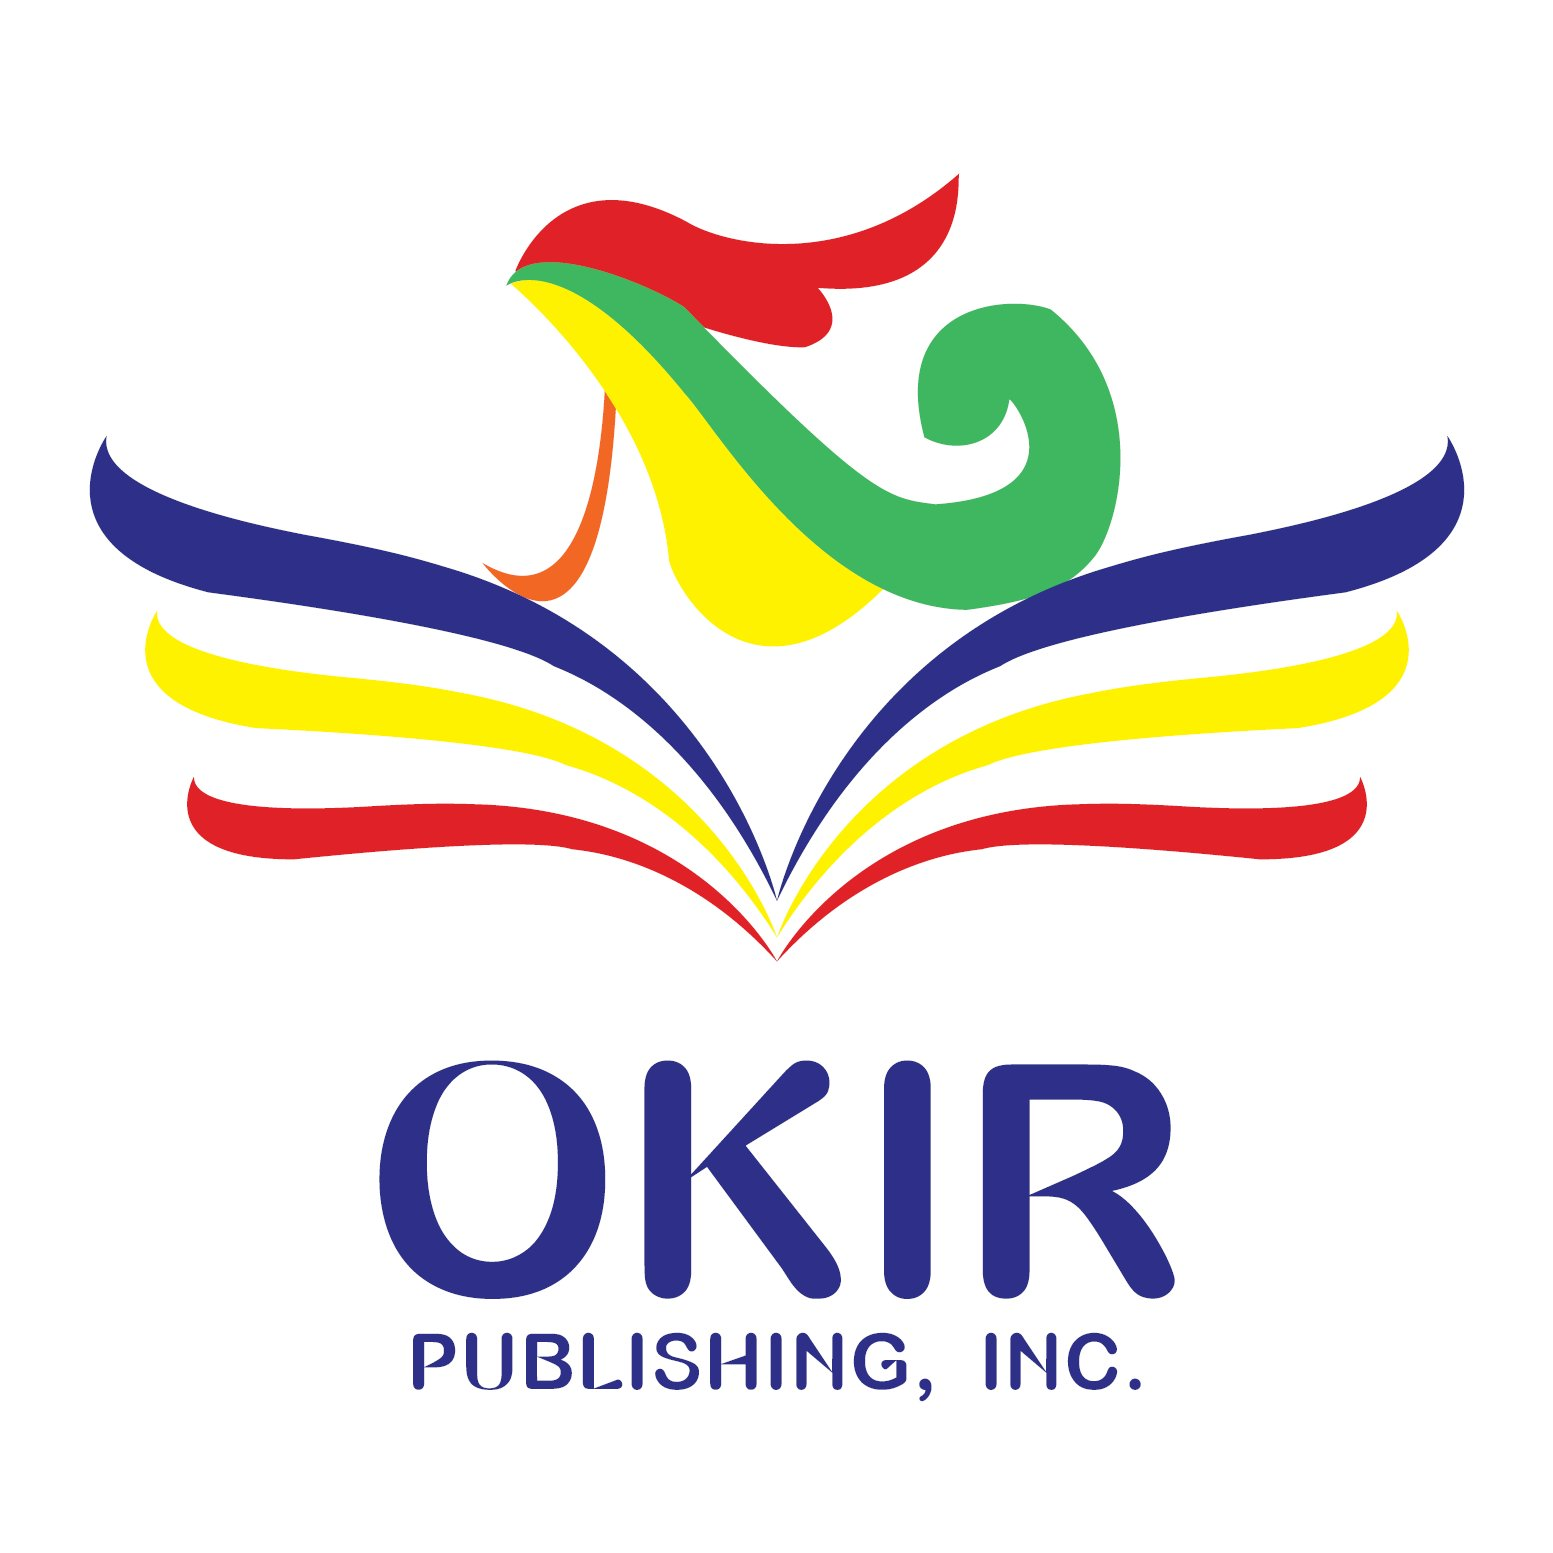 @OkirPublishing